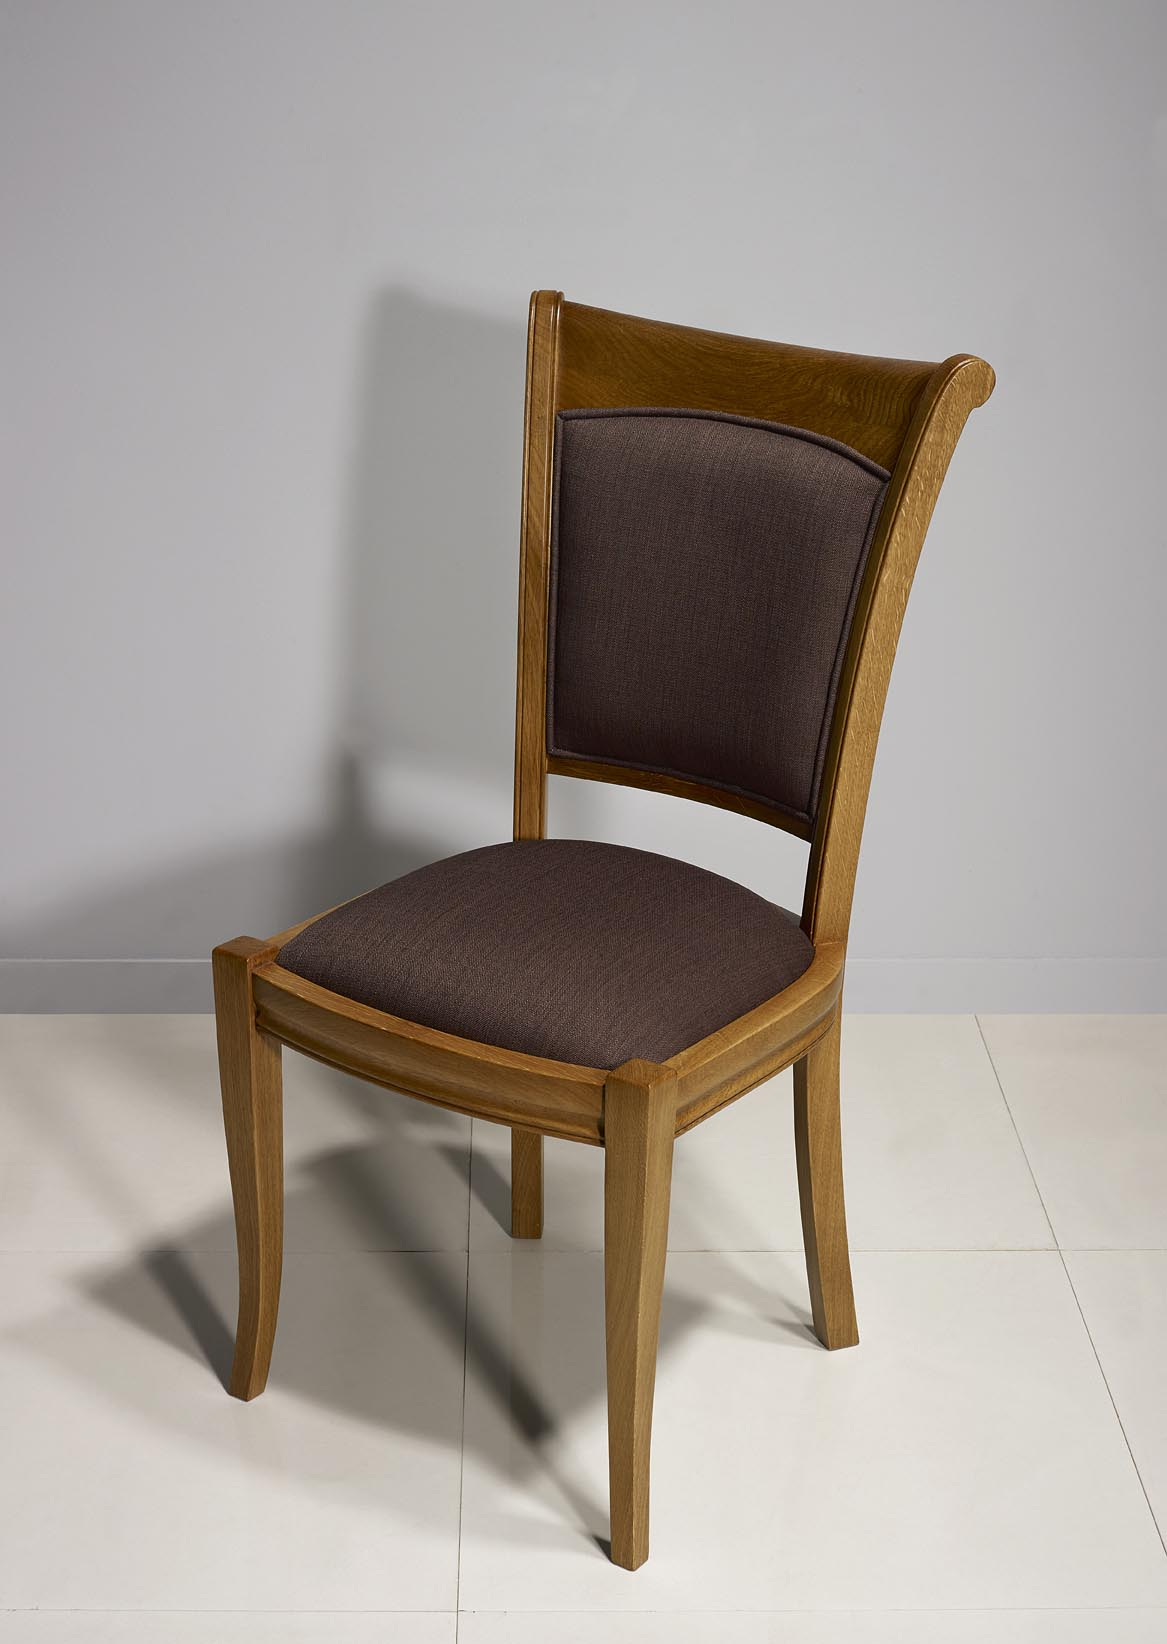 chaise benjamin en ch ne massif de style louis philippe meuble en ch ne. Black Bedroom Furniture Sets. Home Design Ideas